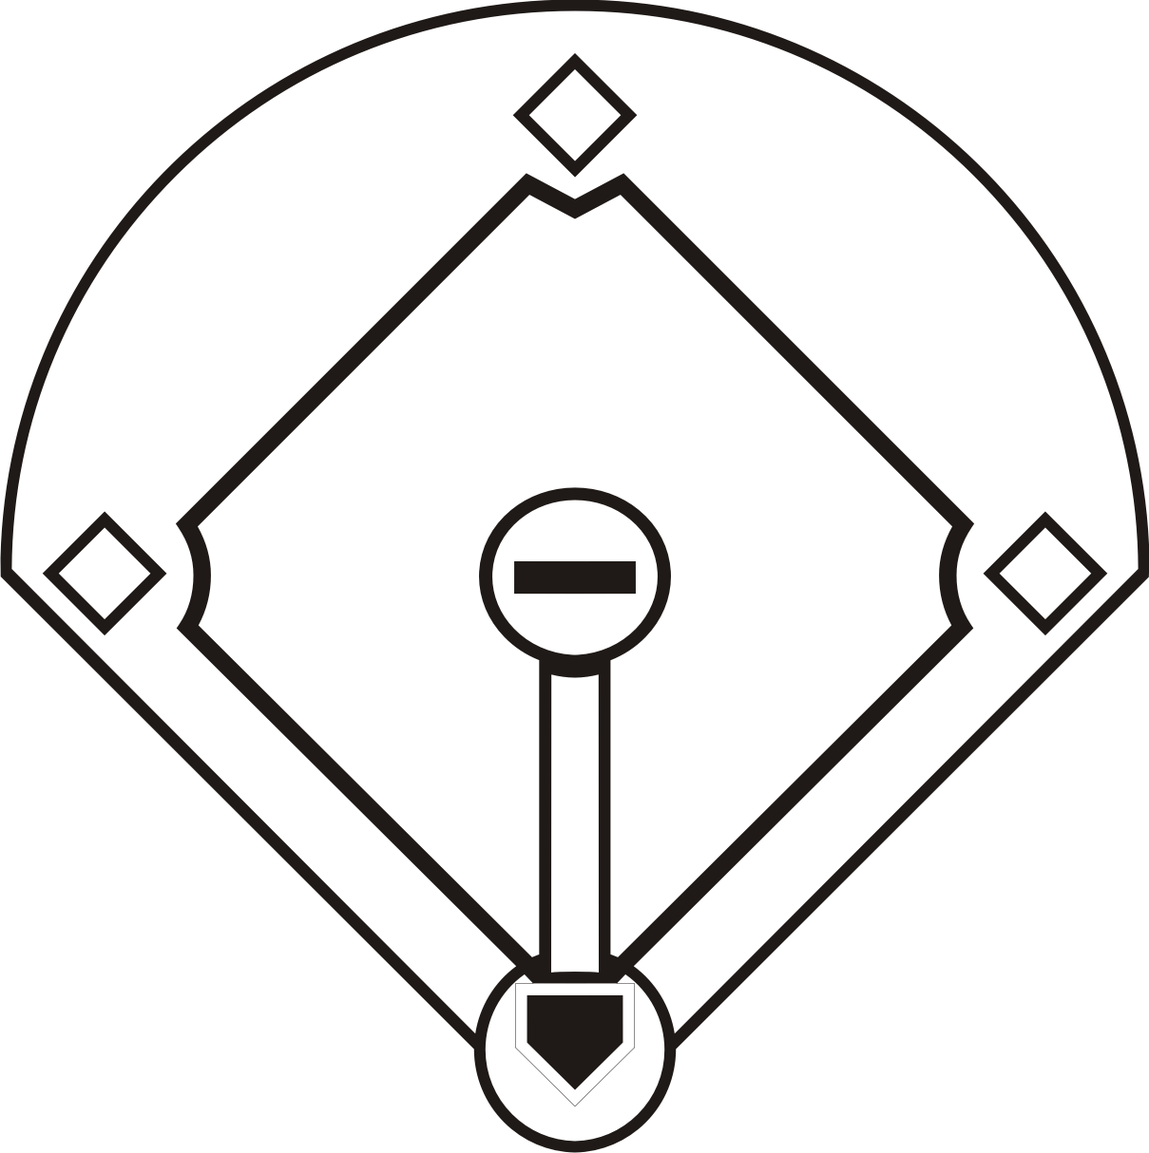 1149x1153 Baseball Diamond Clipart Images 3